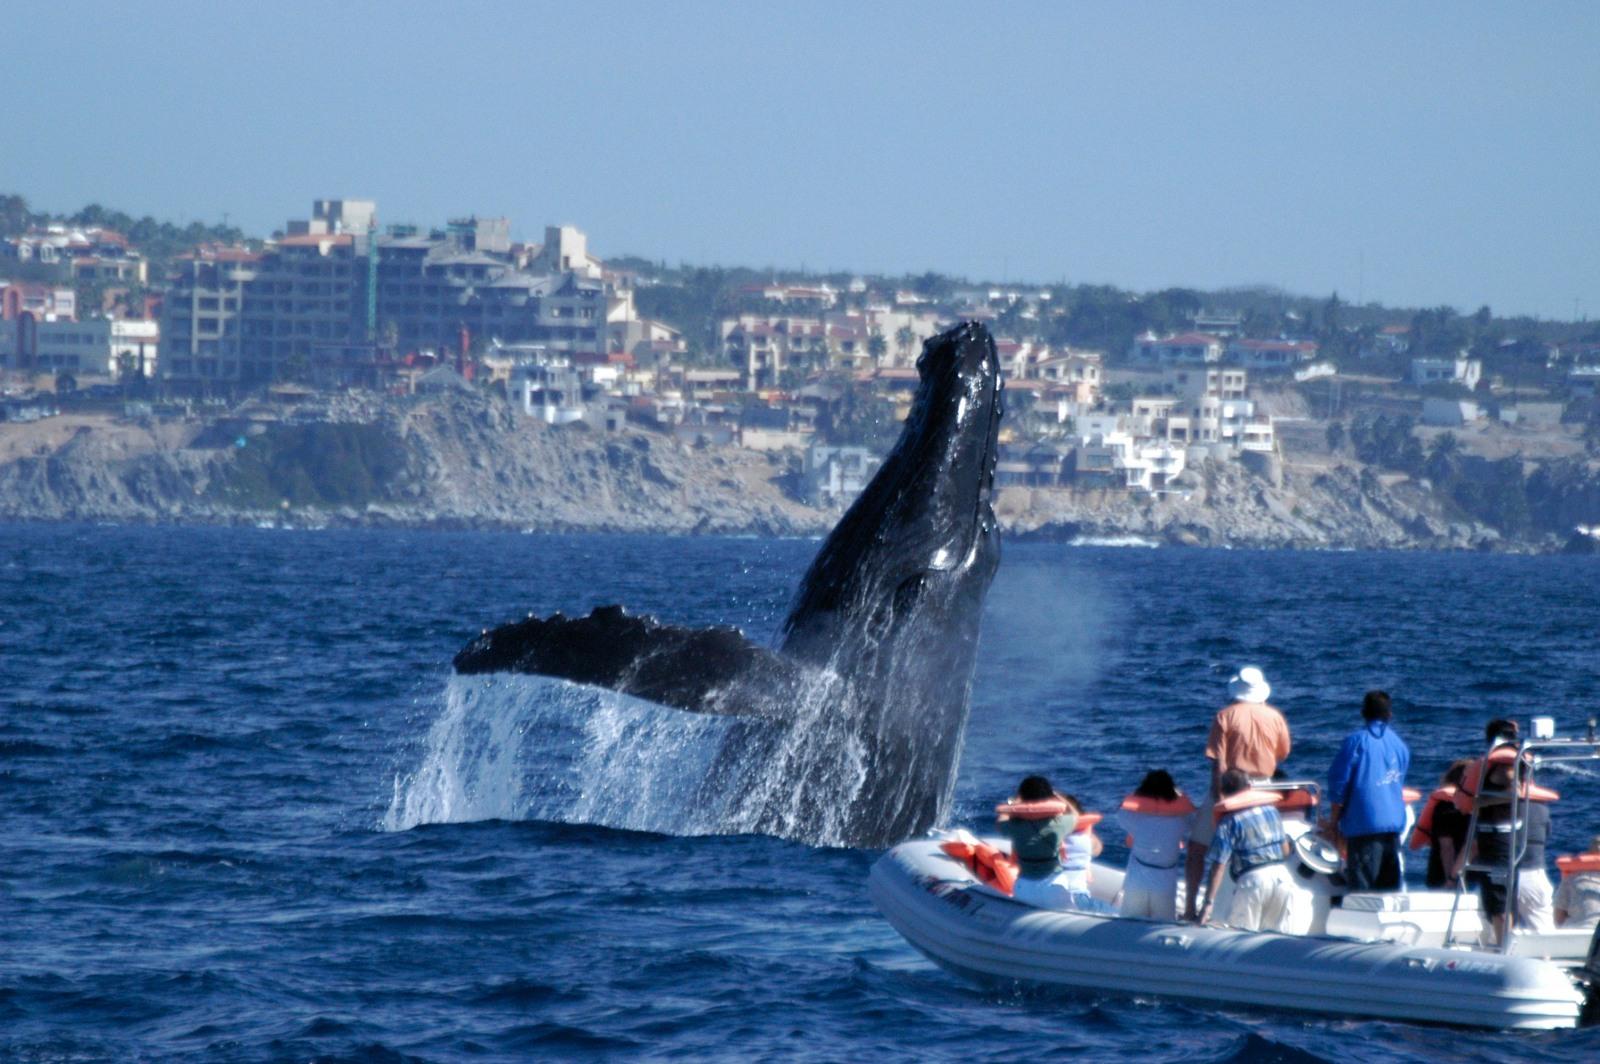 WhaleWatch_08.JPG